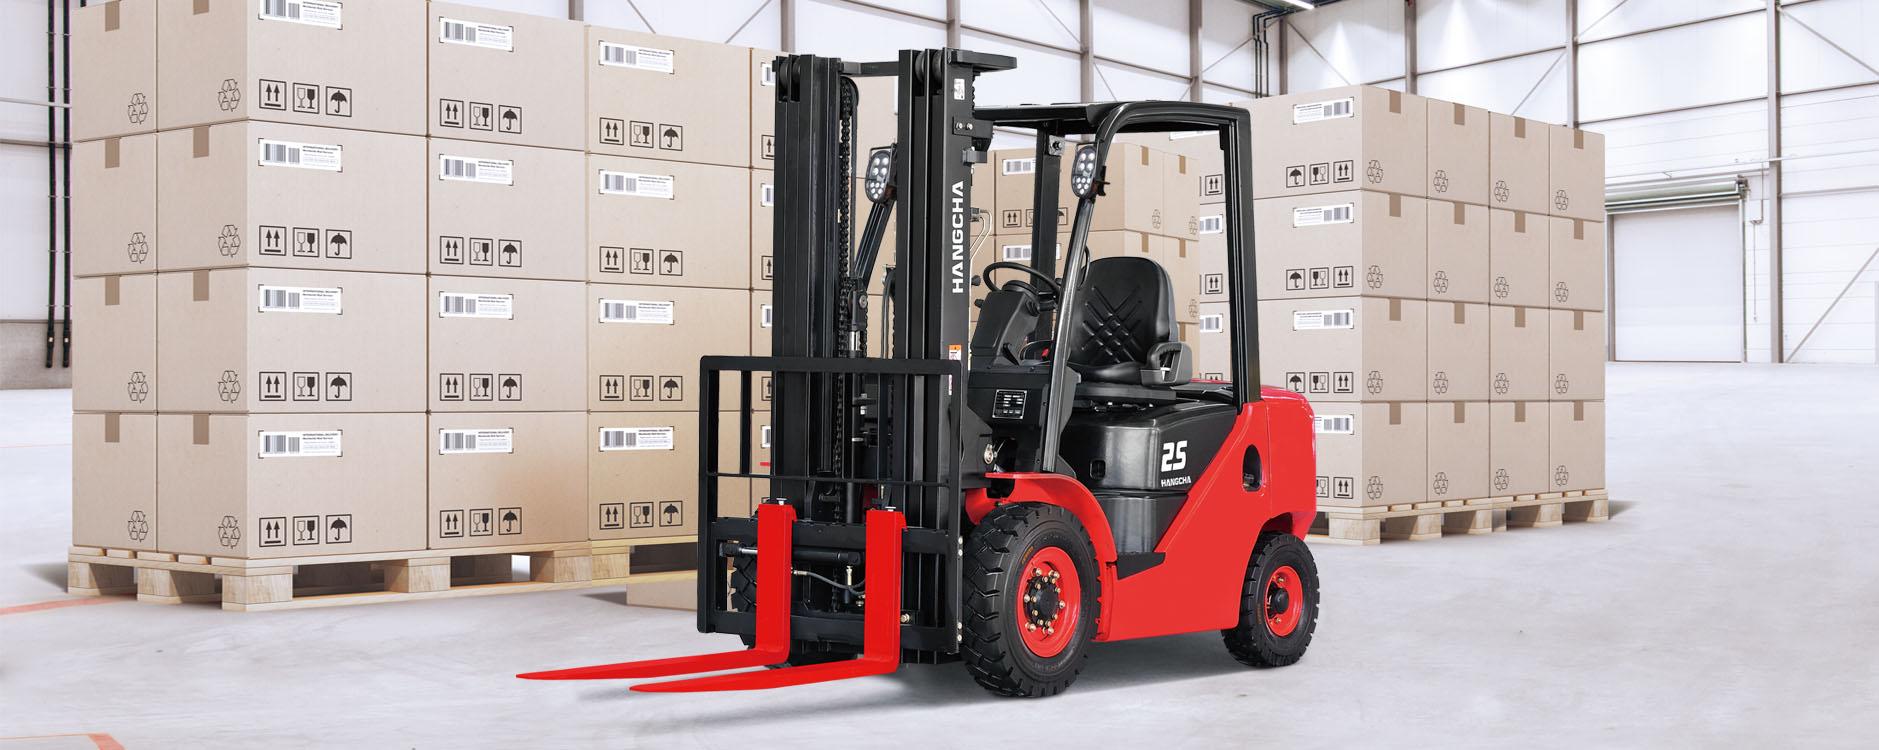 New, 2021, HC Forklift (HANGCHA), FP25, Forklifts / Lift Trucks